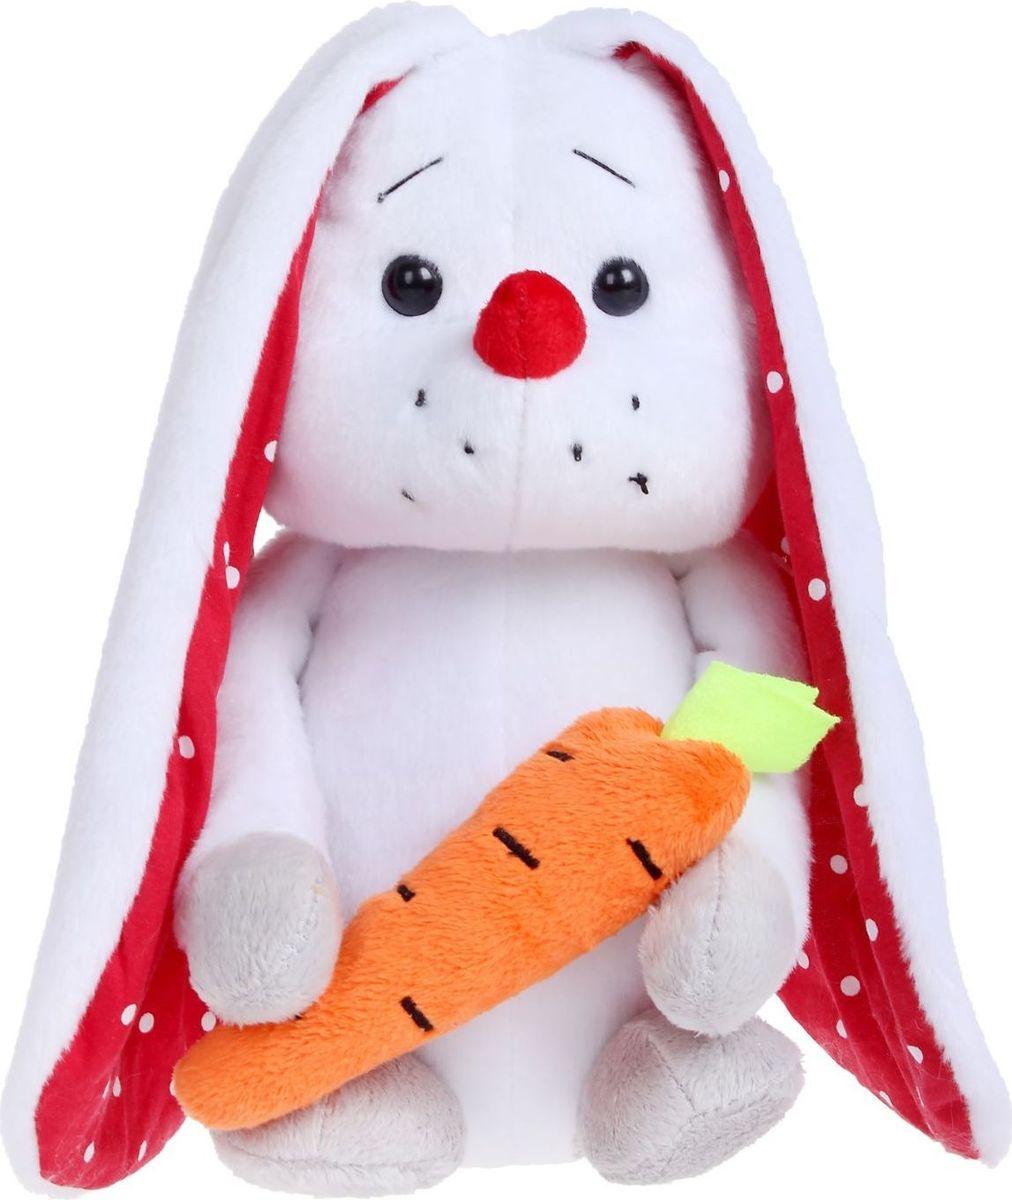 Sima-land Мягкая игрушка Зая с морковкой 28 см фонтант sima land летняя прохлада колодец